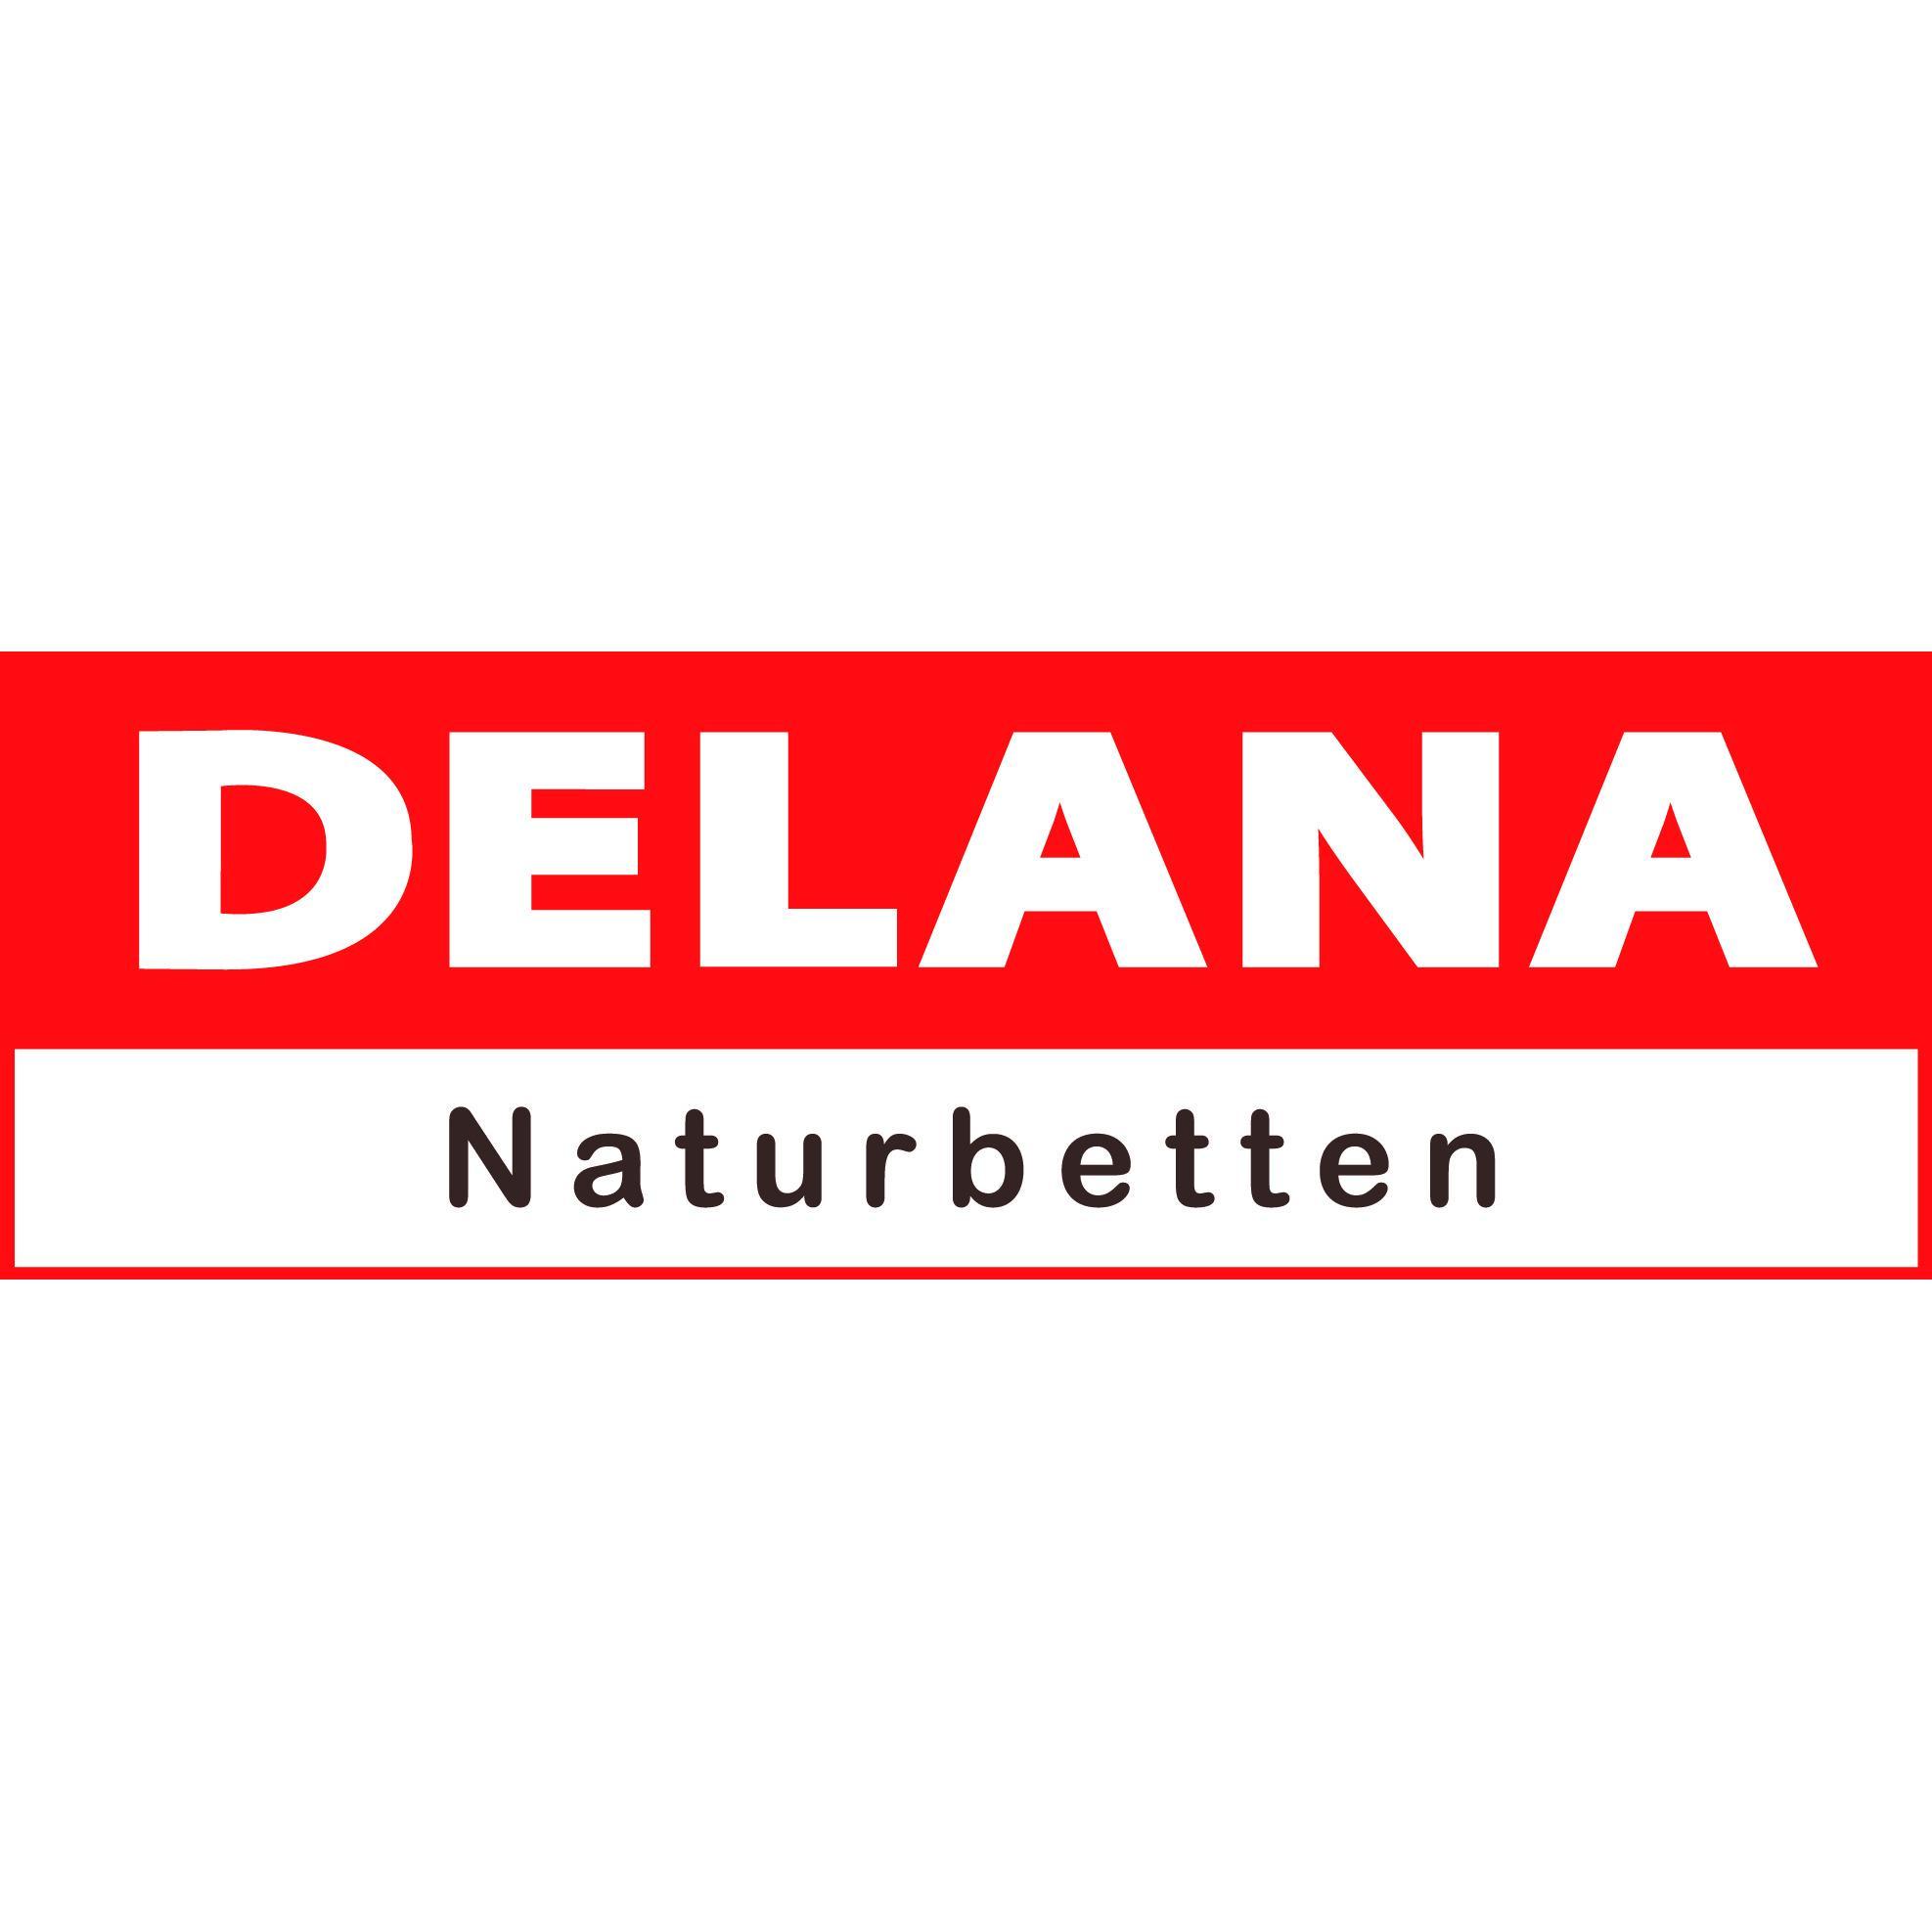 DELANA Naturbetten Logo